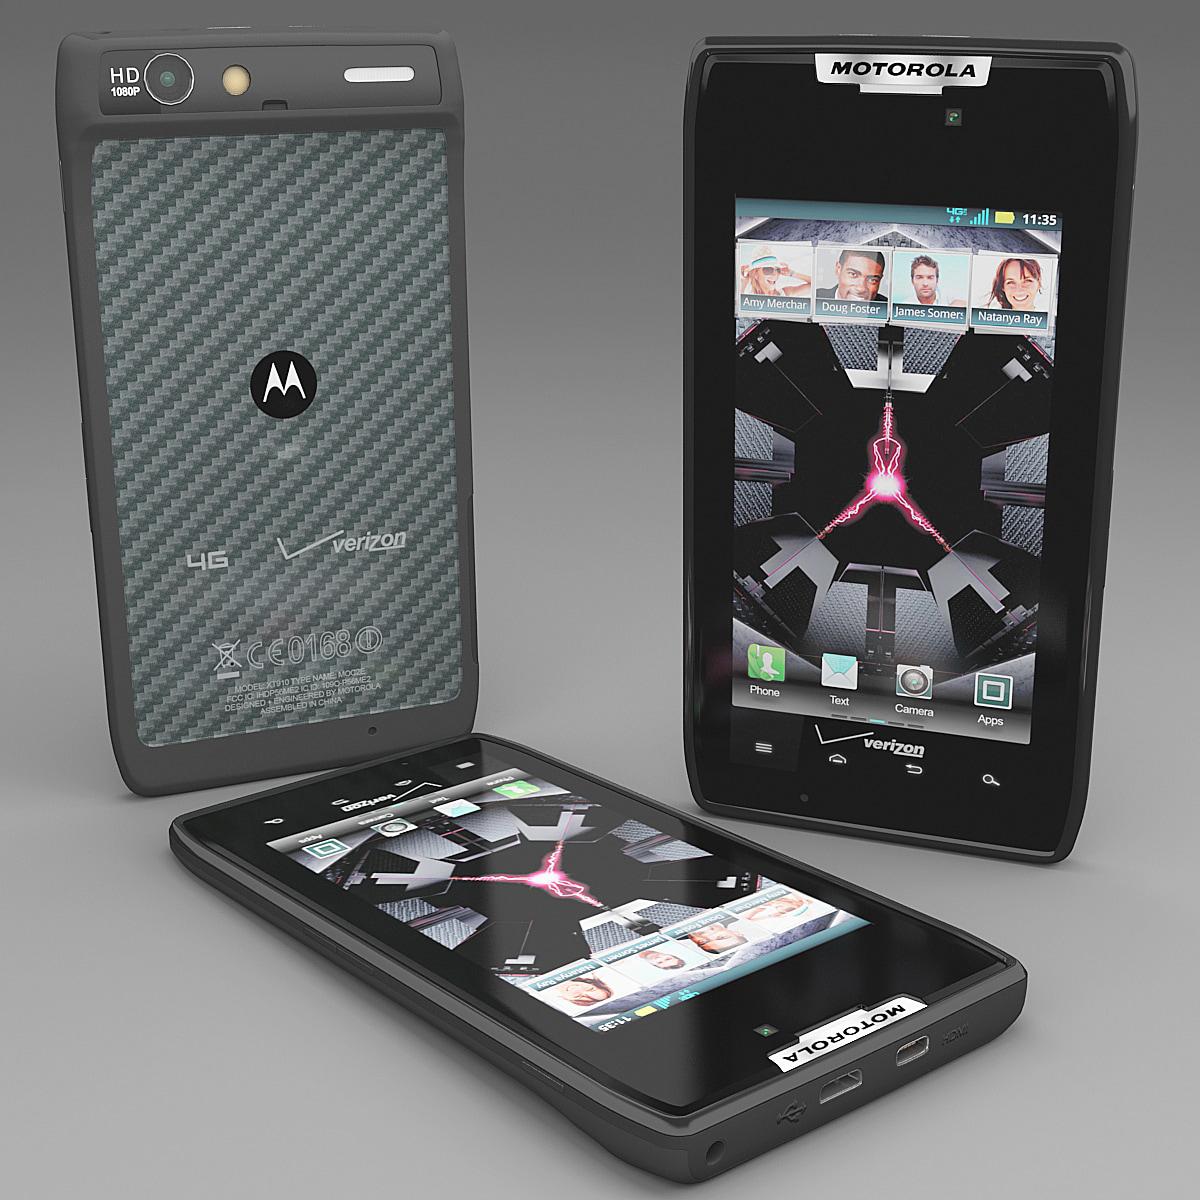 Motorola_Droid_Razr_Vray_1.jpg